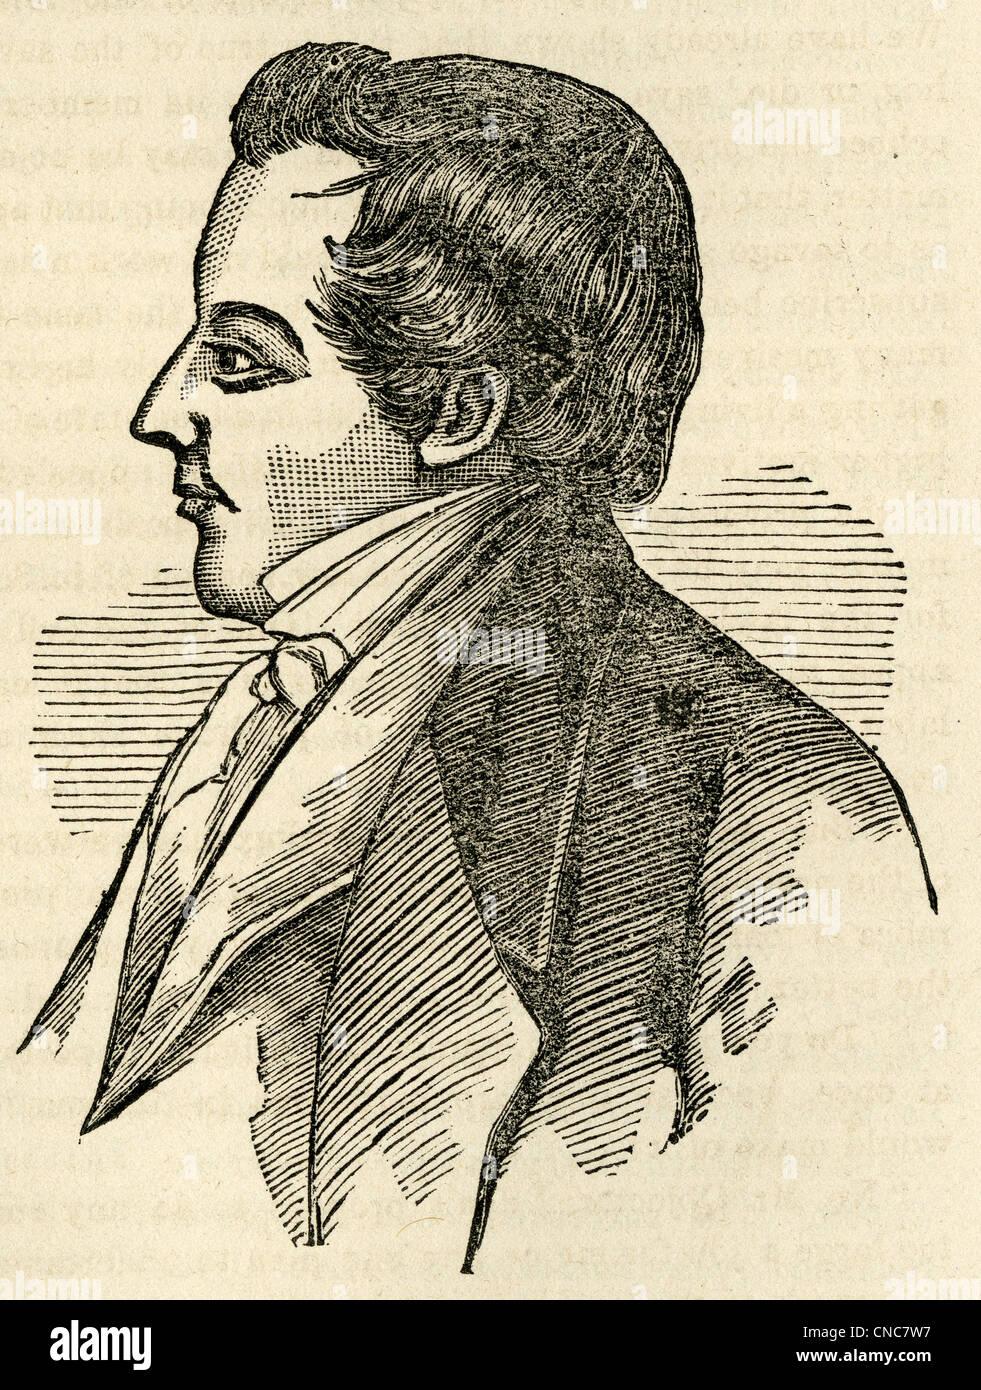 Simples 1871 xilogravura gravura de Joseph Smith, Jr. Imagens de Stock